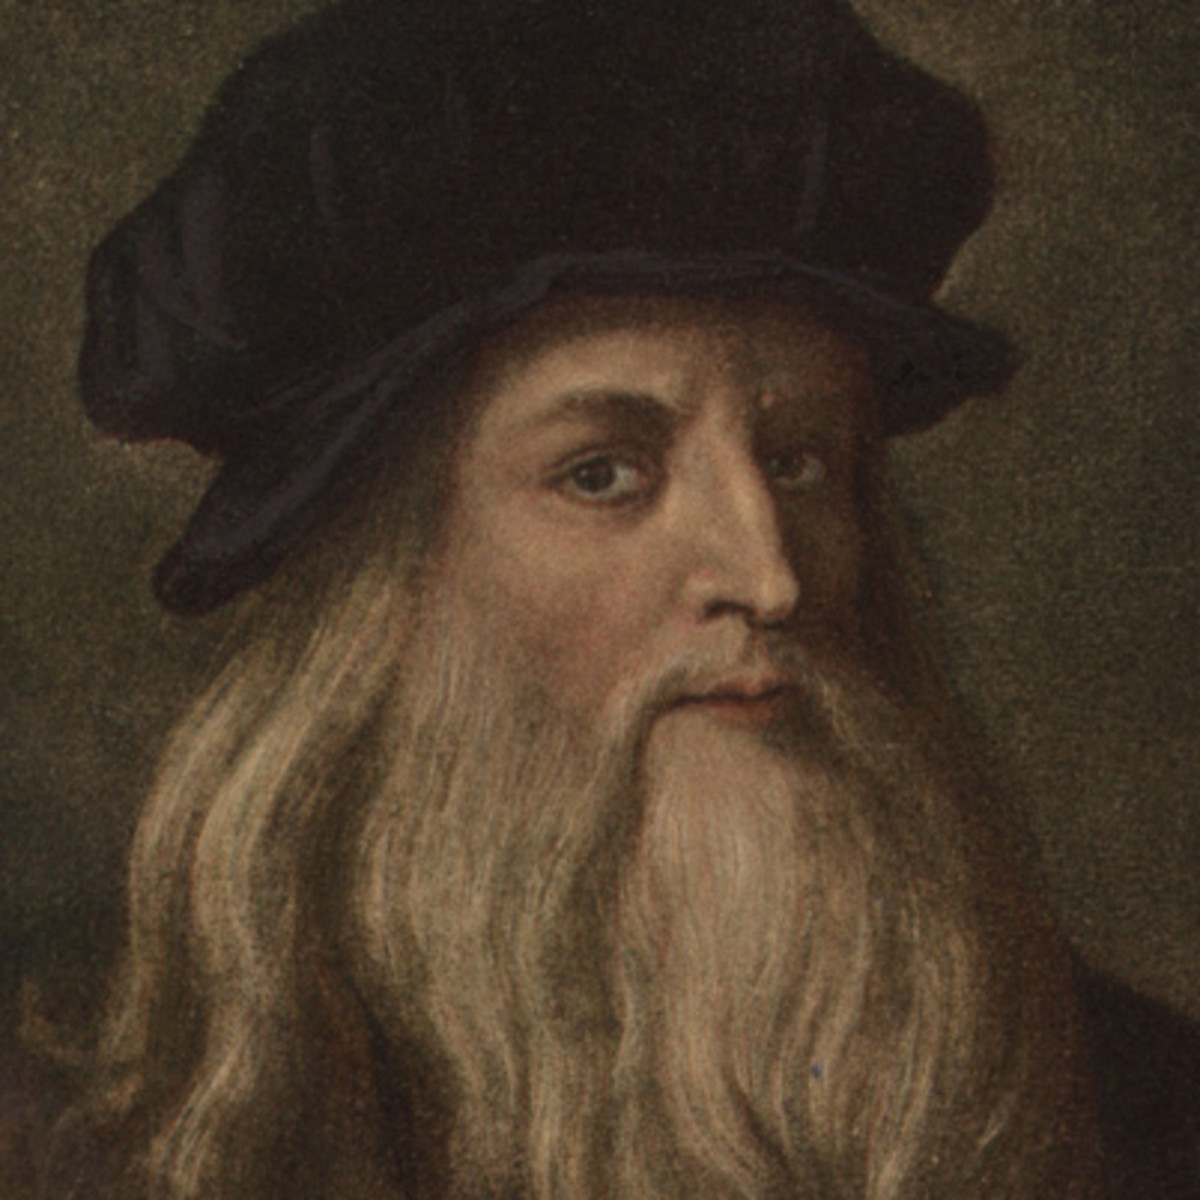 ¿Quién era realmente la madre de Leonardo da Vinci?